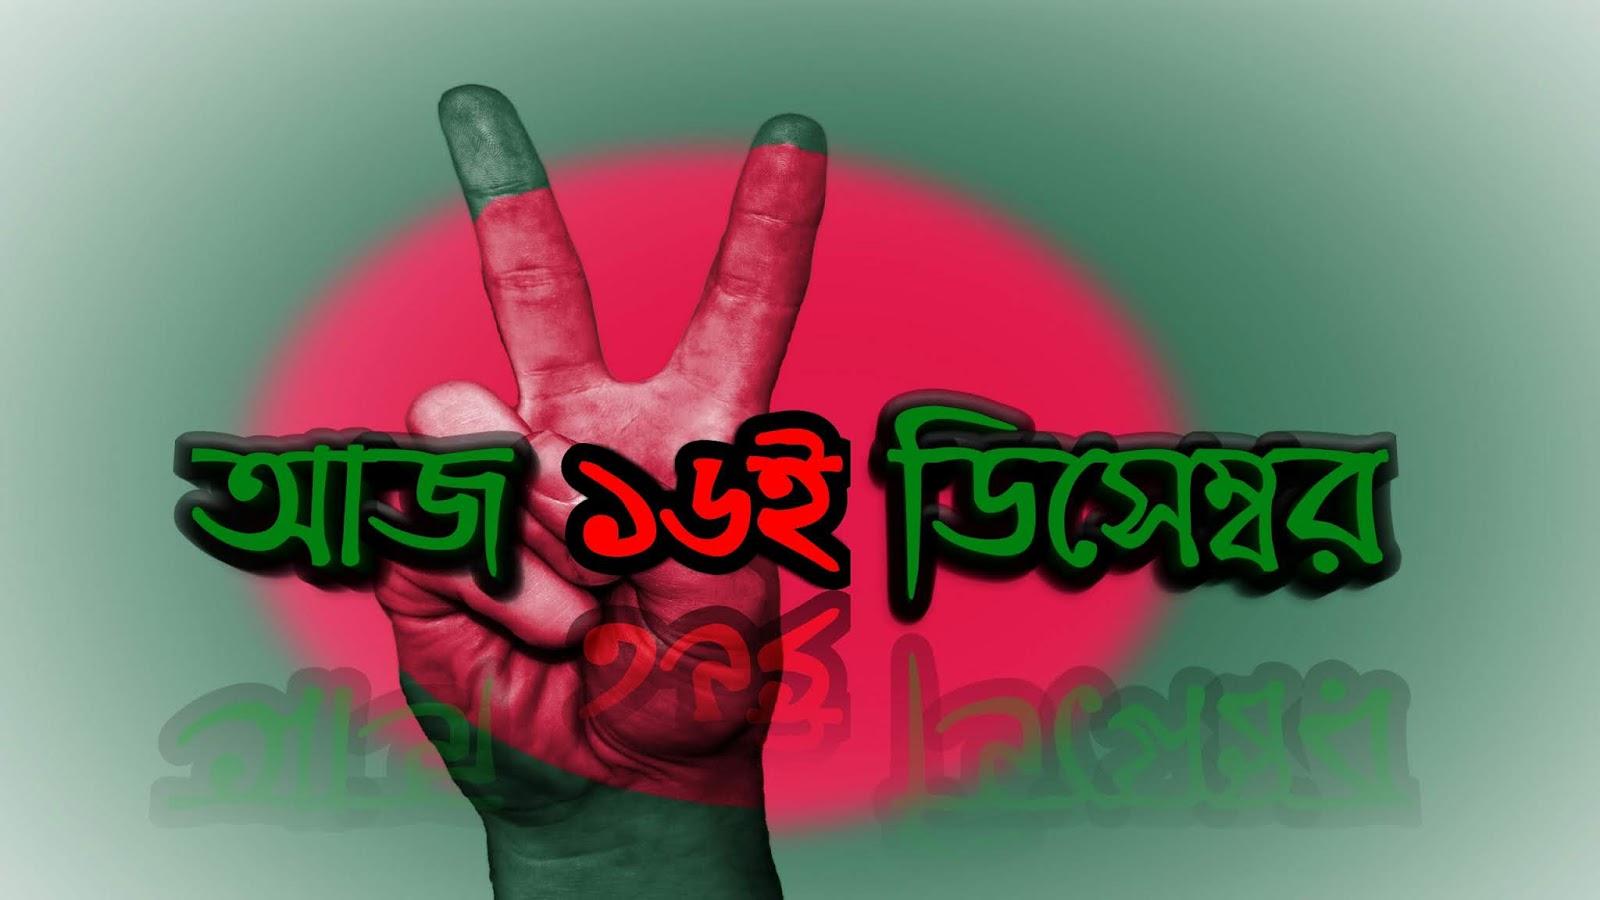 16 December Victory Day Bangladesh Wallpaper - 16 December Status Bangla , HD Wallpaper & Backgrounds